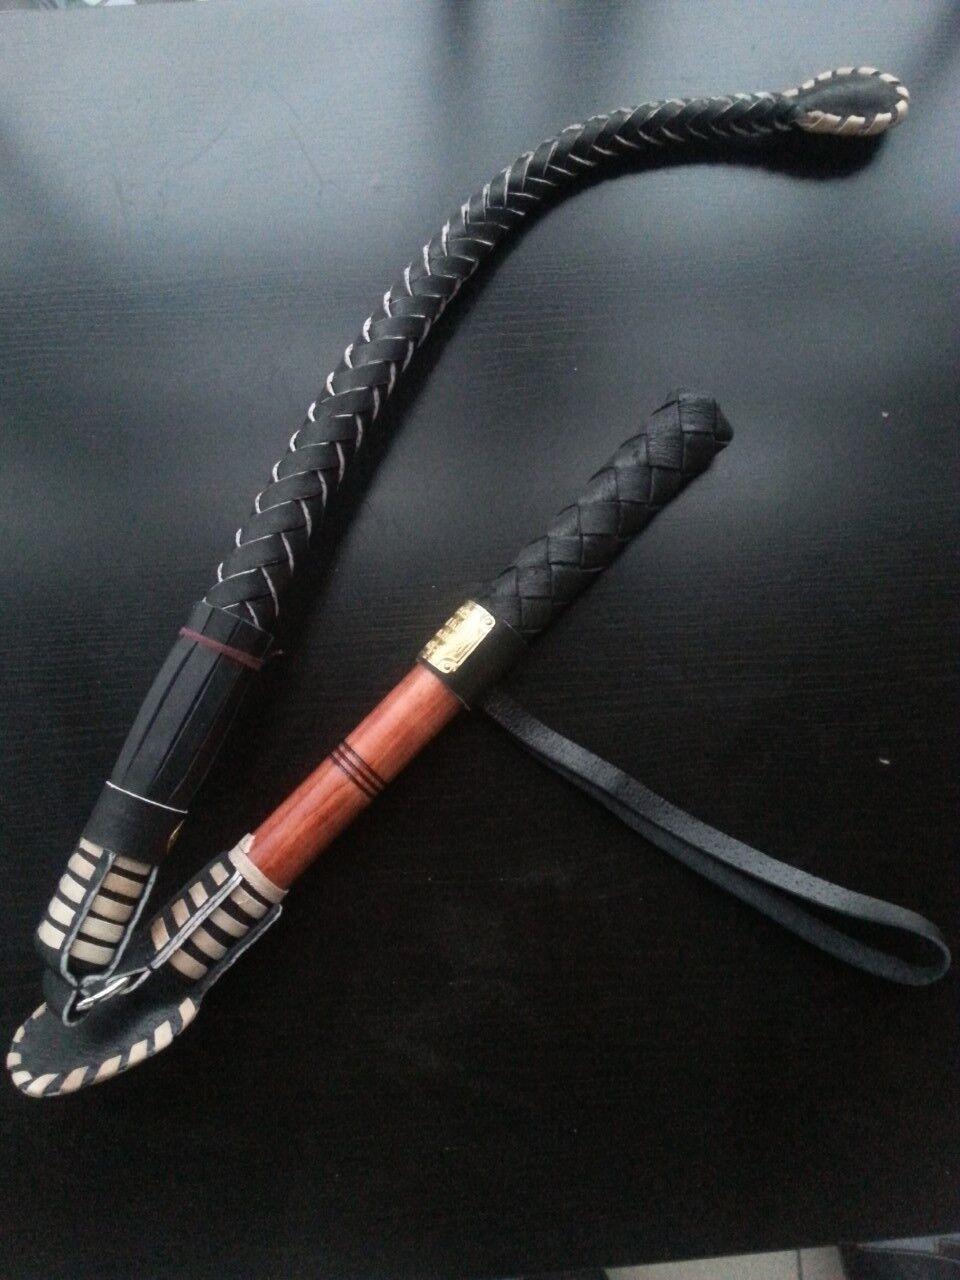 Leather Nagaika Genuine  Leather Whip Scorpion  2018 latest